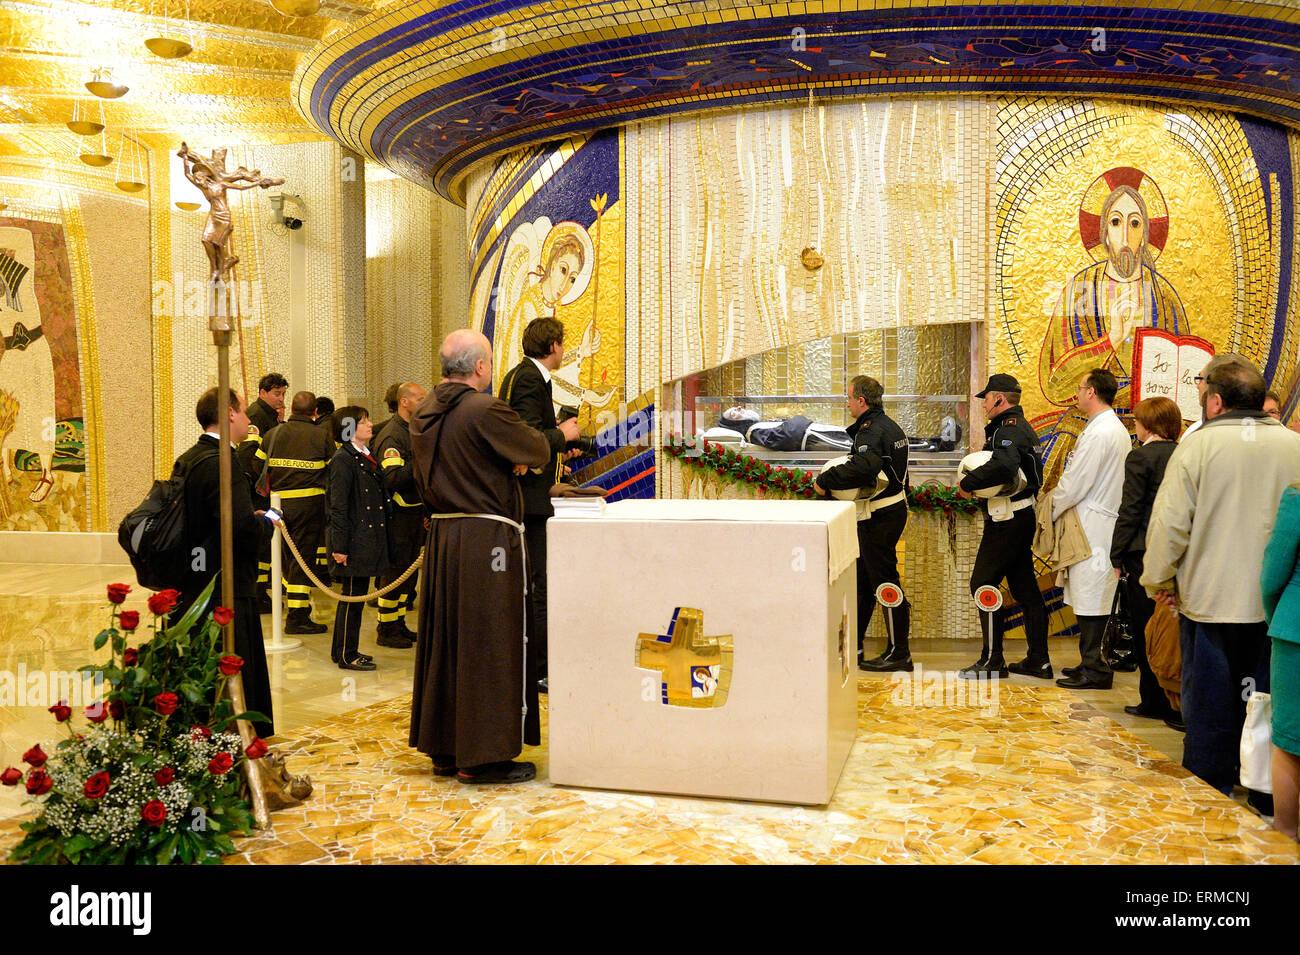 St Pio Stock Photos & St Pio Stock Images - Alamy